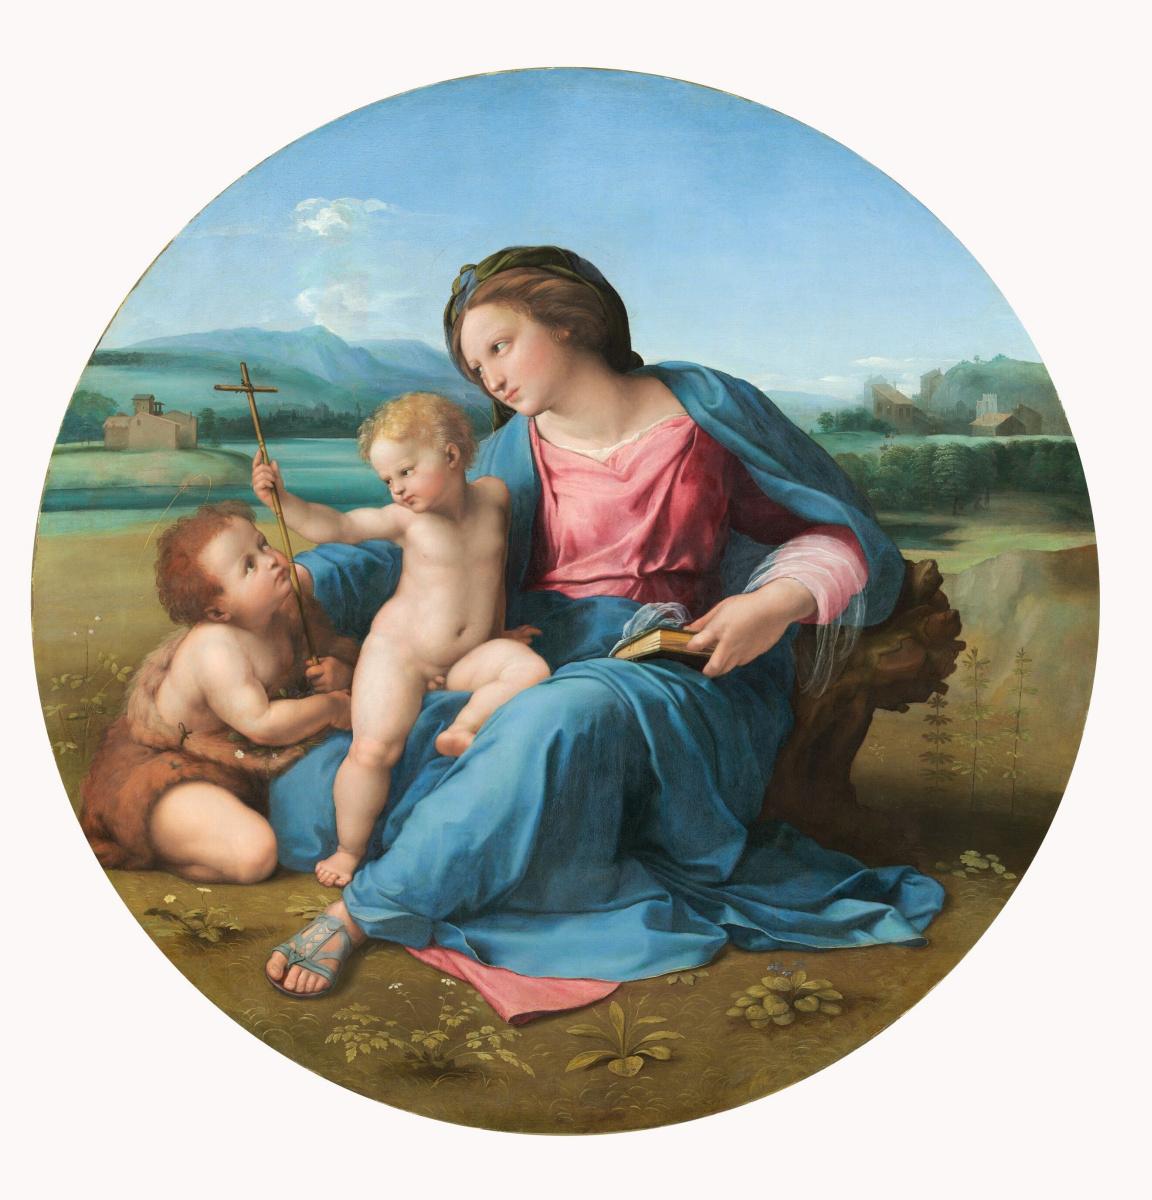 Raphael Sanzio. The Alba Madonna